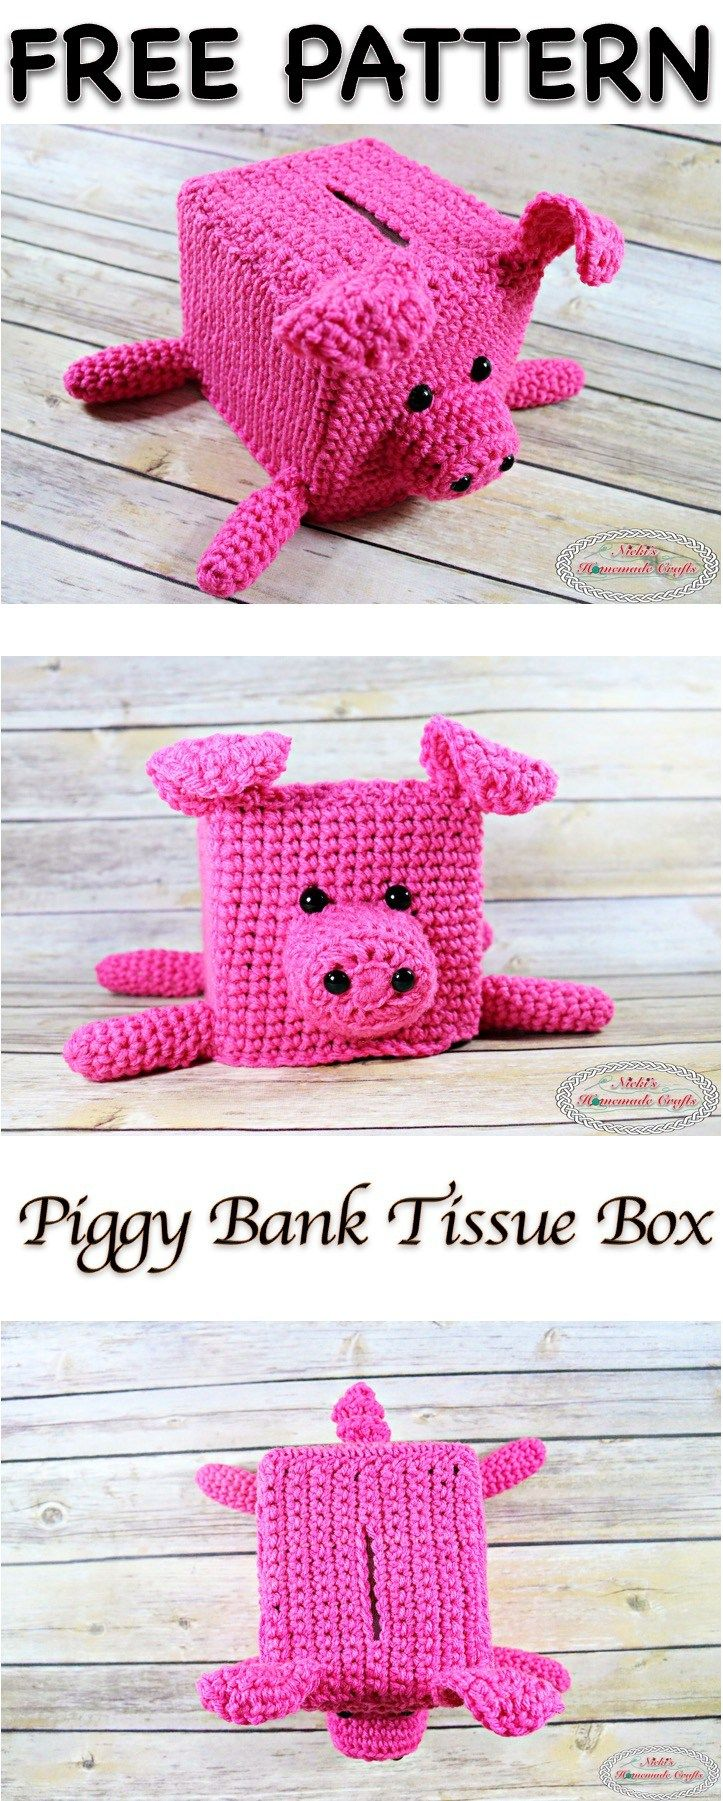 Piggy Bank Tissue Box By Nicole Riley - Free Crochet Pattern - (nickishomemadecrafts)